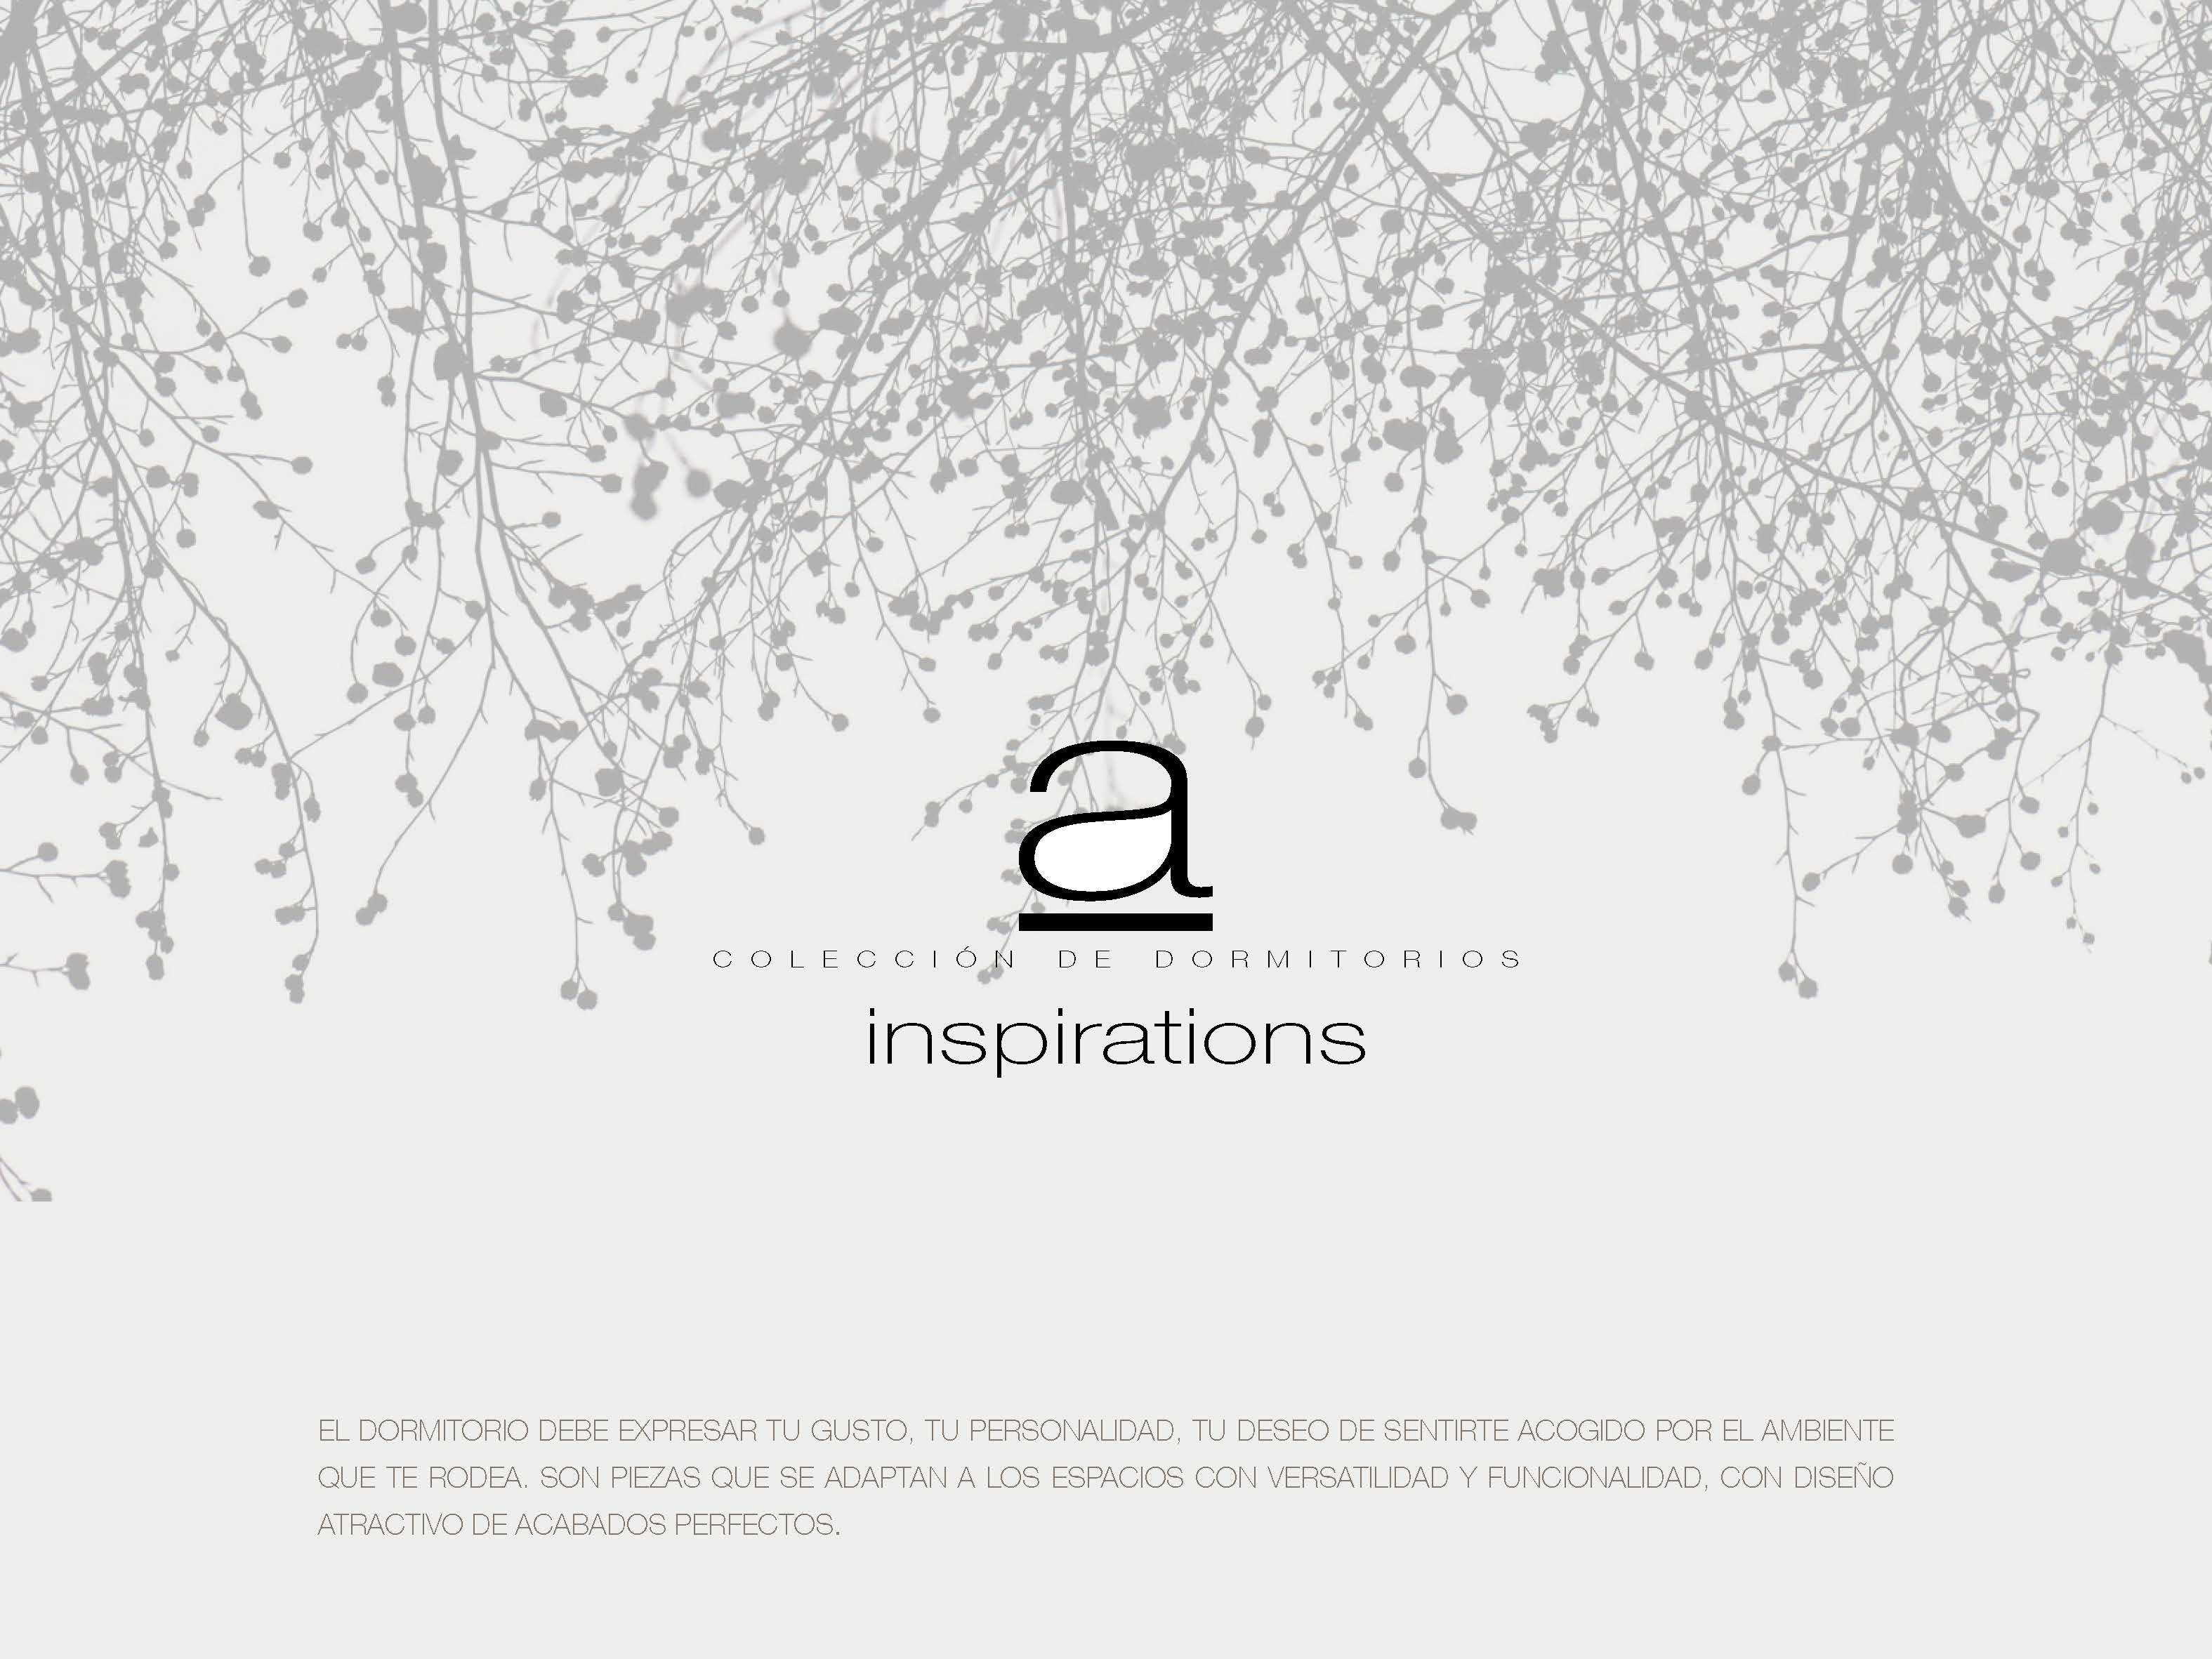 inspirations03